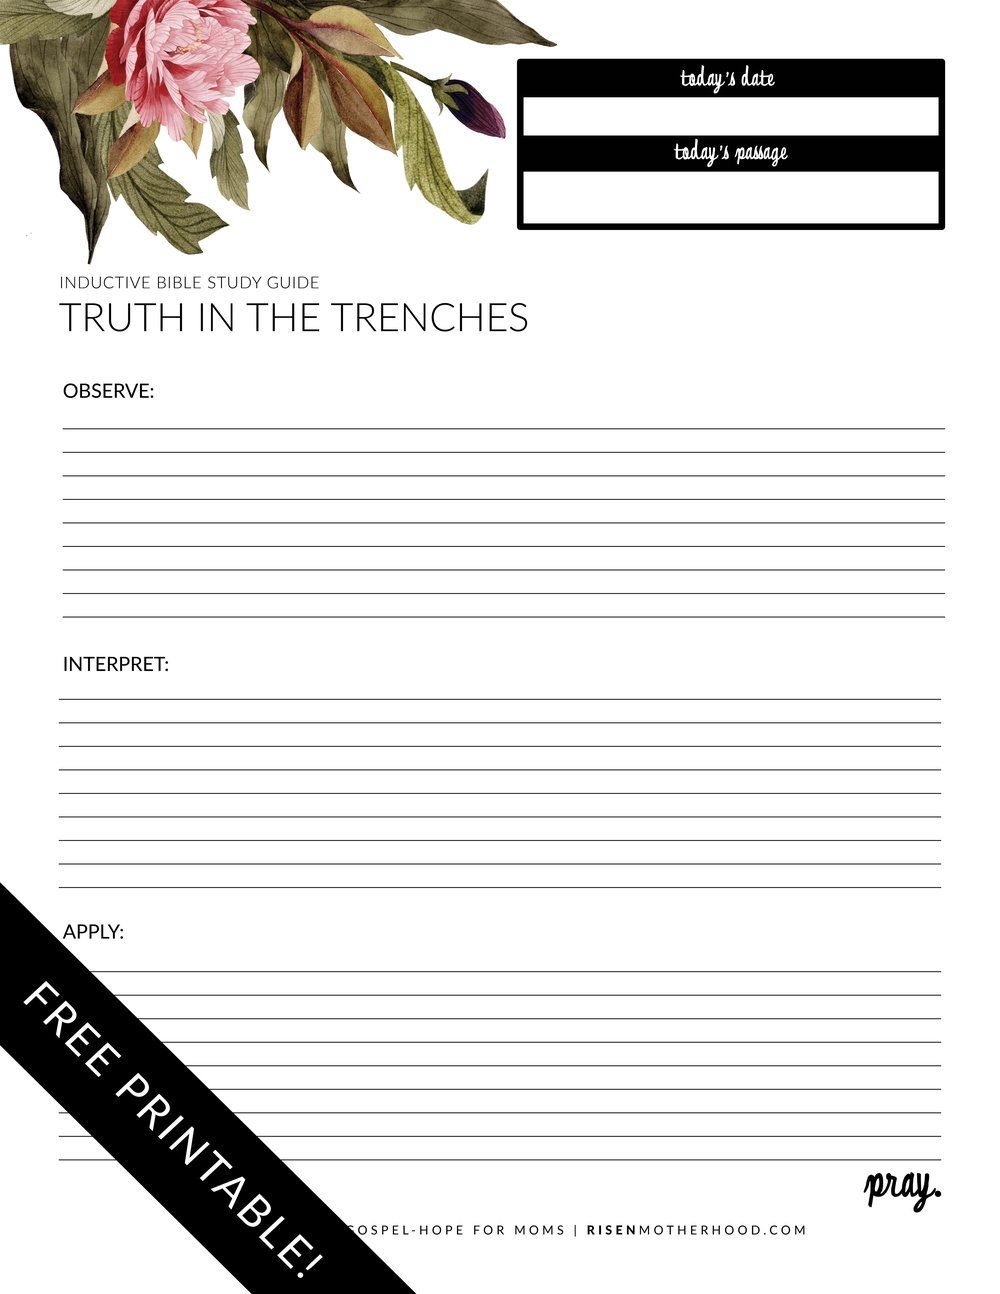 Free Printable Inductive Bible Study Worksheets  Companion Card For Free Printable Bible Study Worksheets